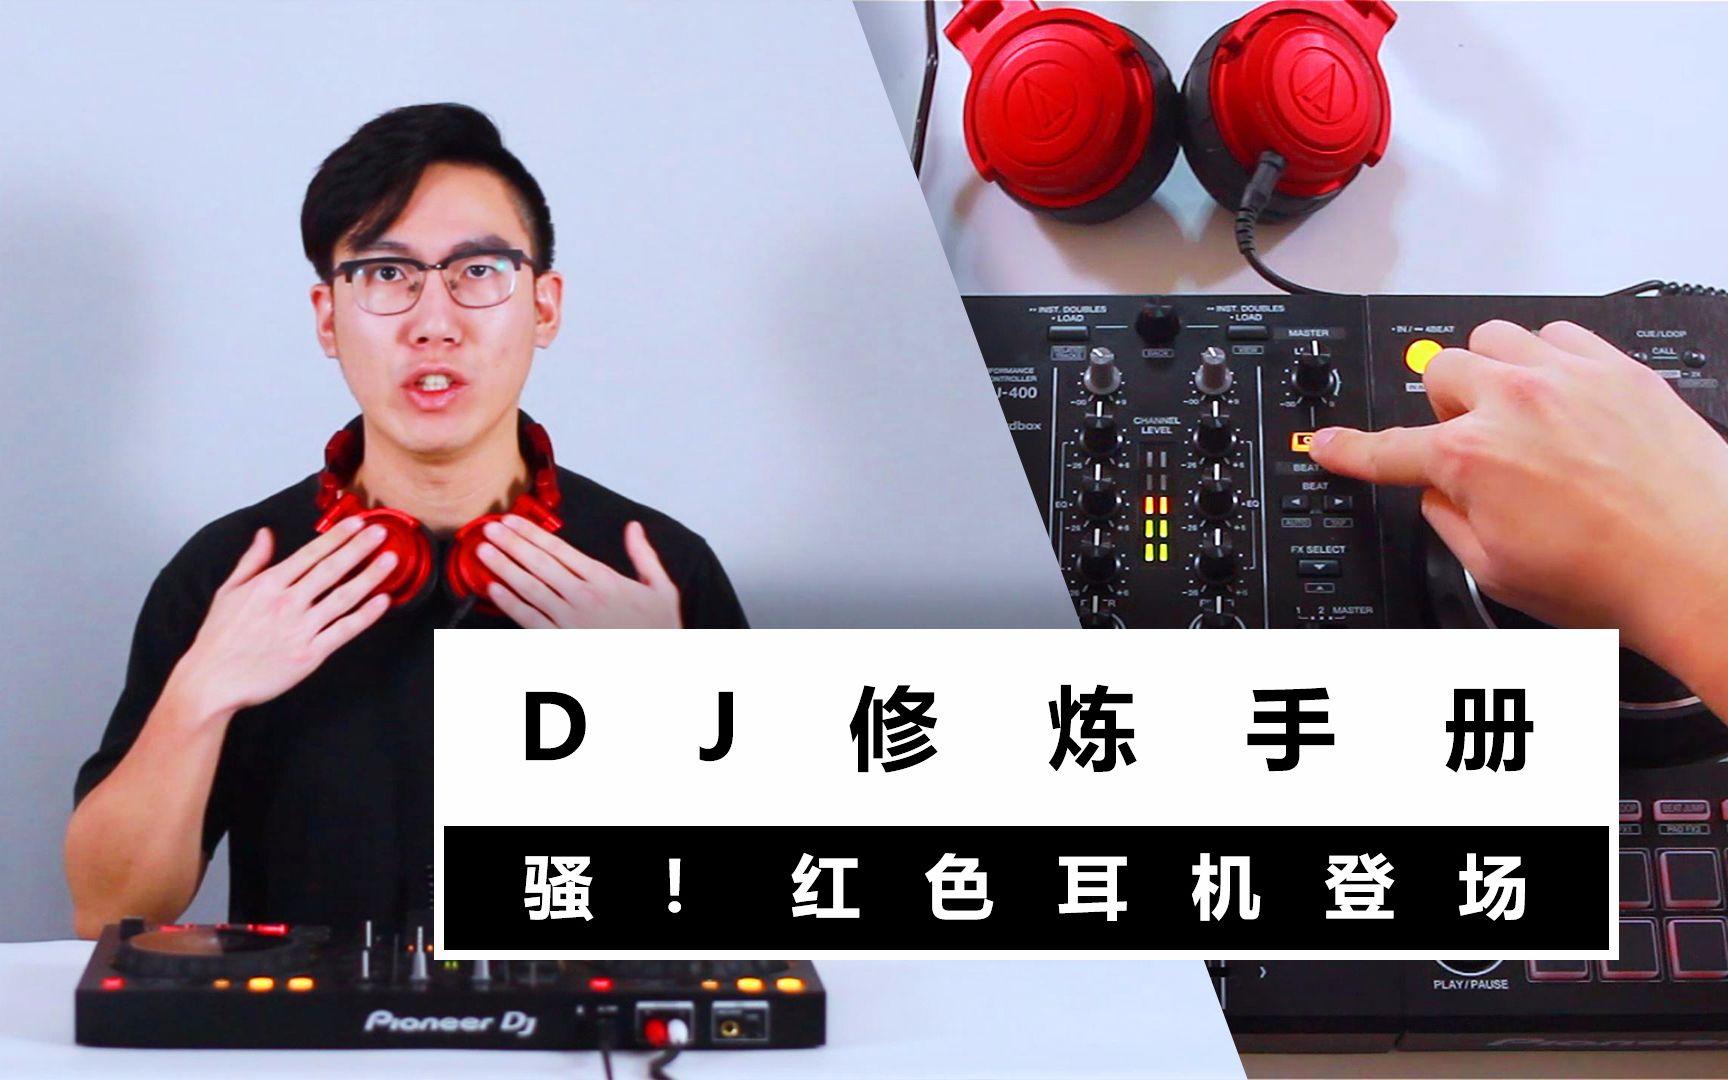 【DJ修煉手冊】教程10. 騷!紅色耳機登場 - 使用打碟機控制監聽耳機_嗶哩嗶哩 (゜-゜)つロ 干杯~-bilibili